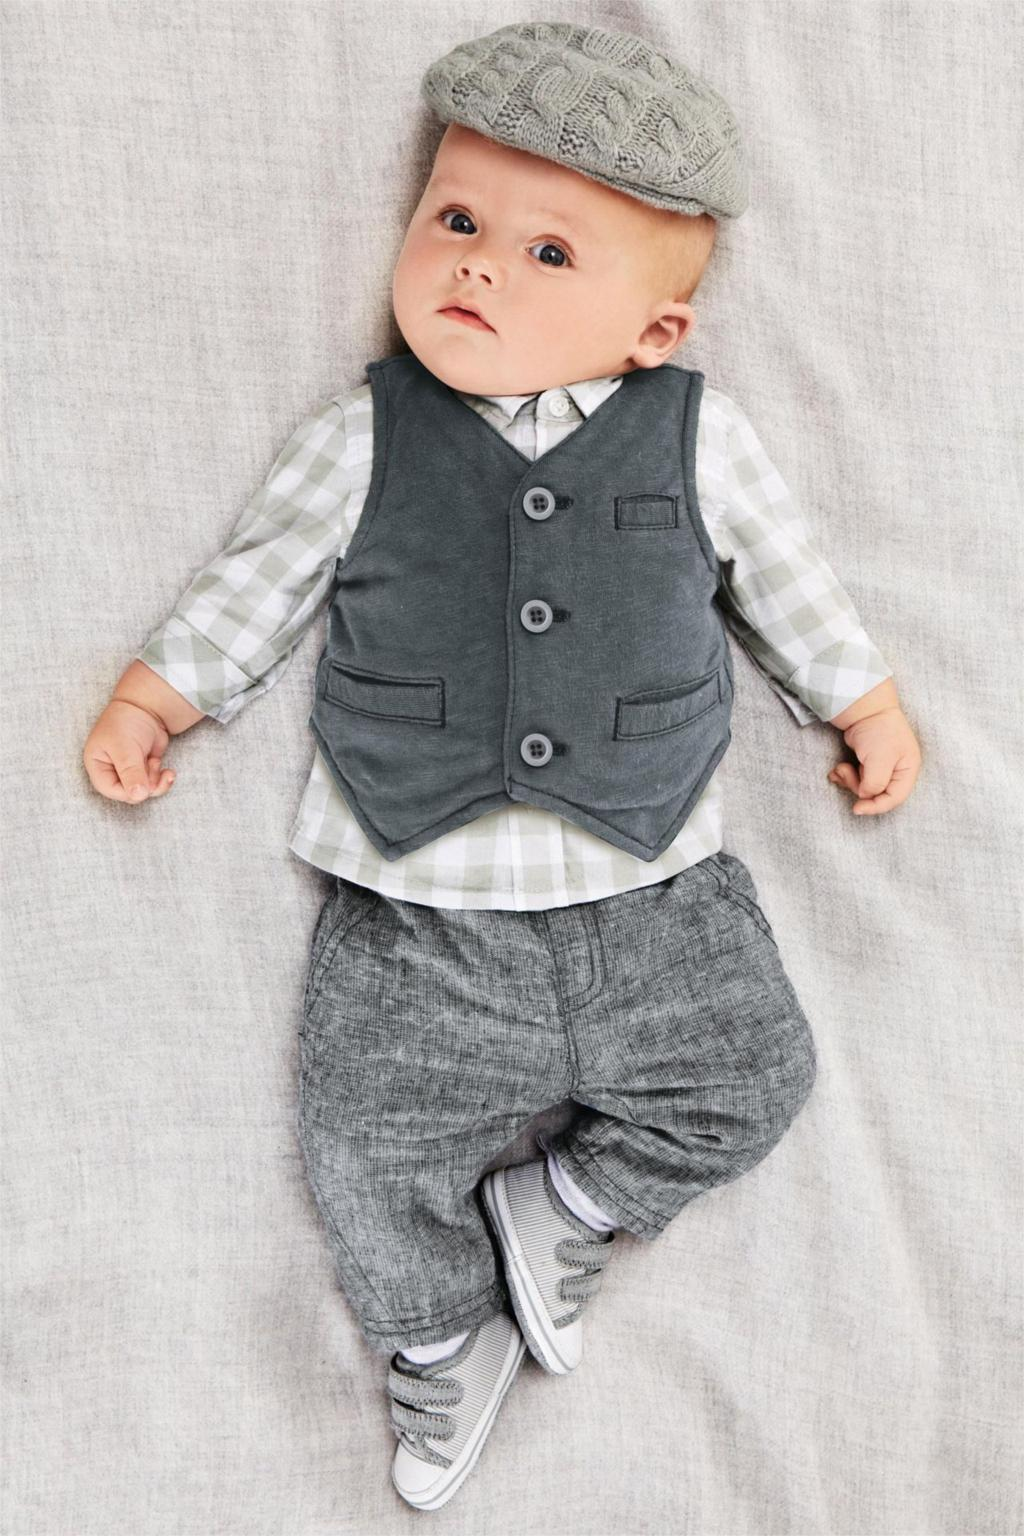 2015 Cute baby boy clothes 3pcs newborn boy outfits infant ...